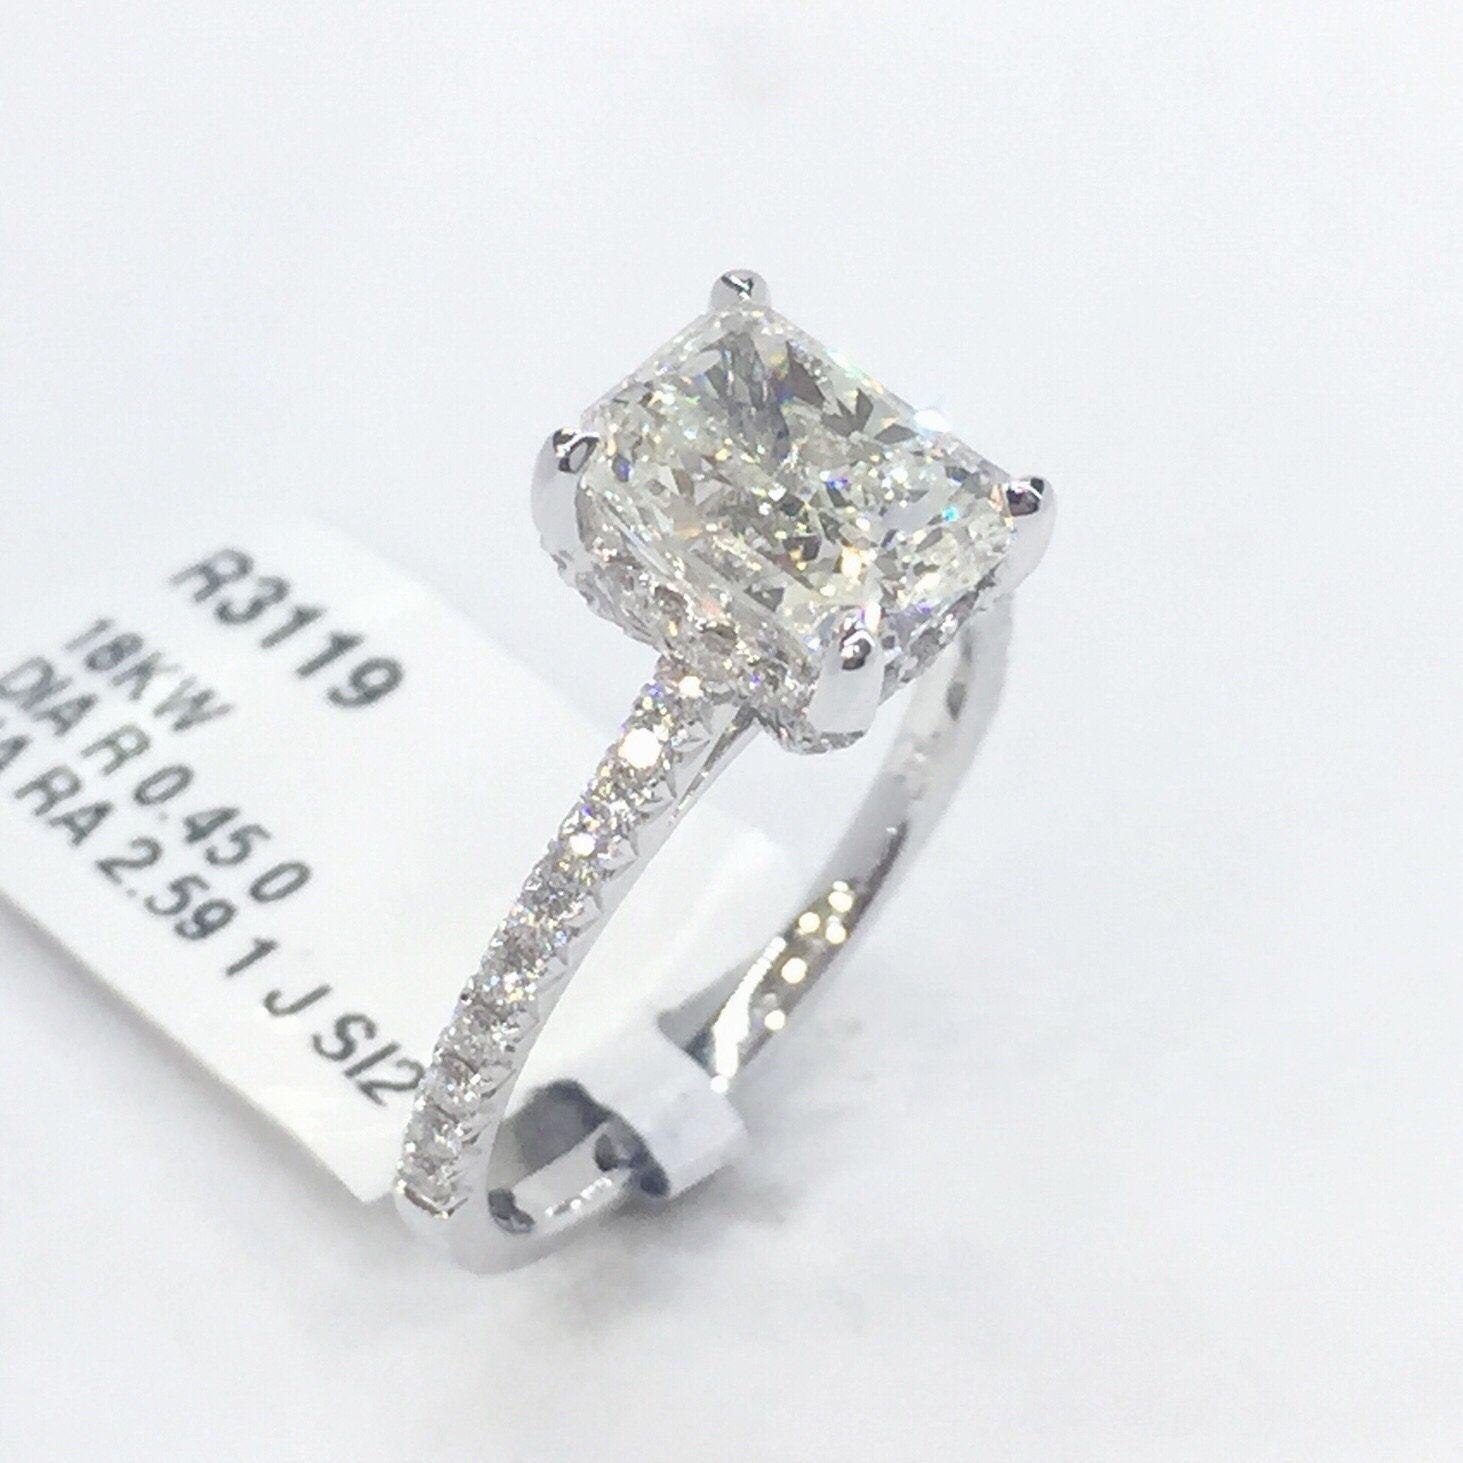 K white gold j si ct radiant cut solitare diamond engagement